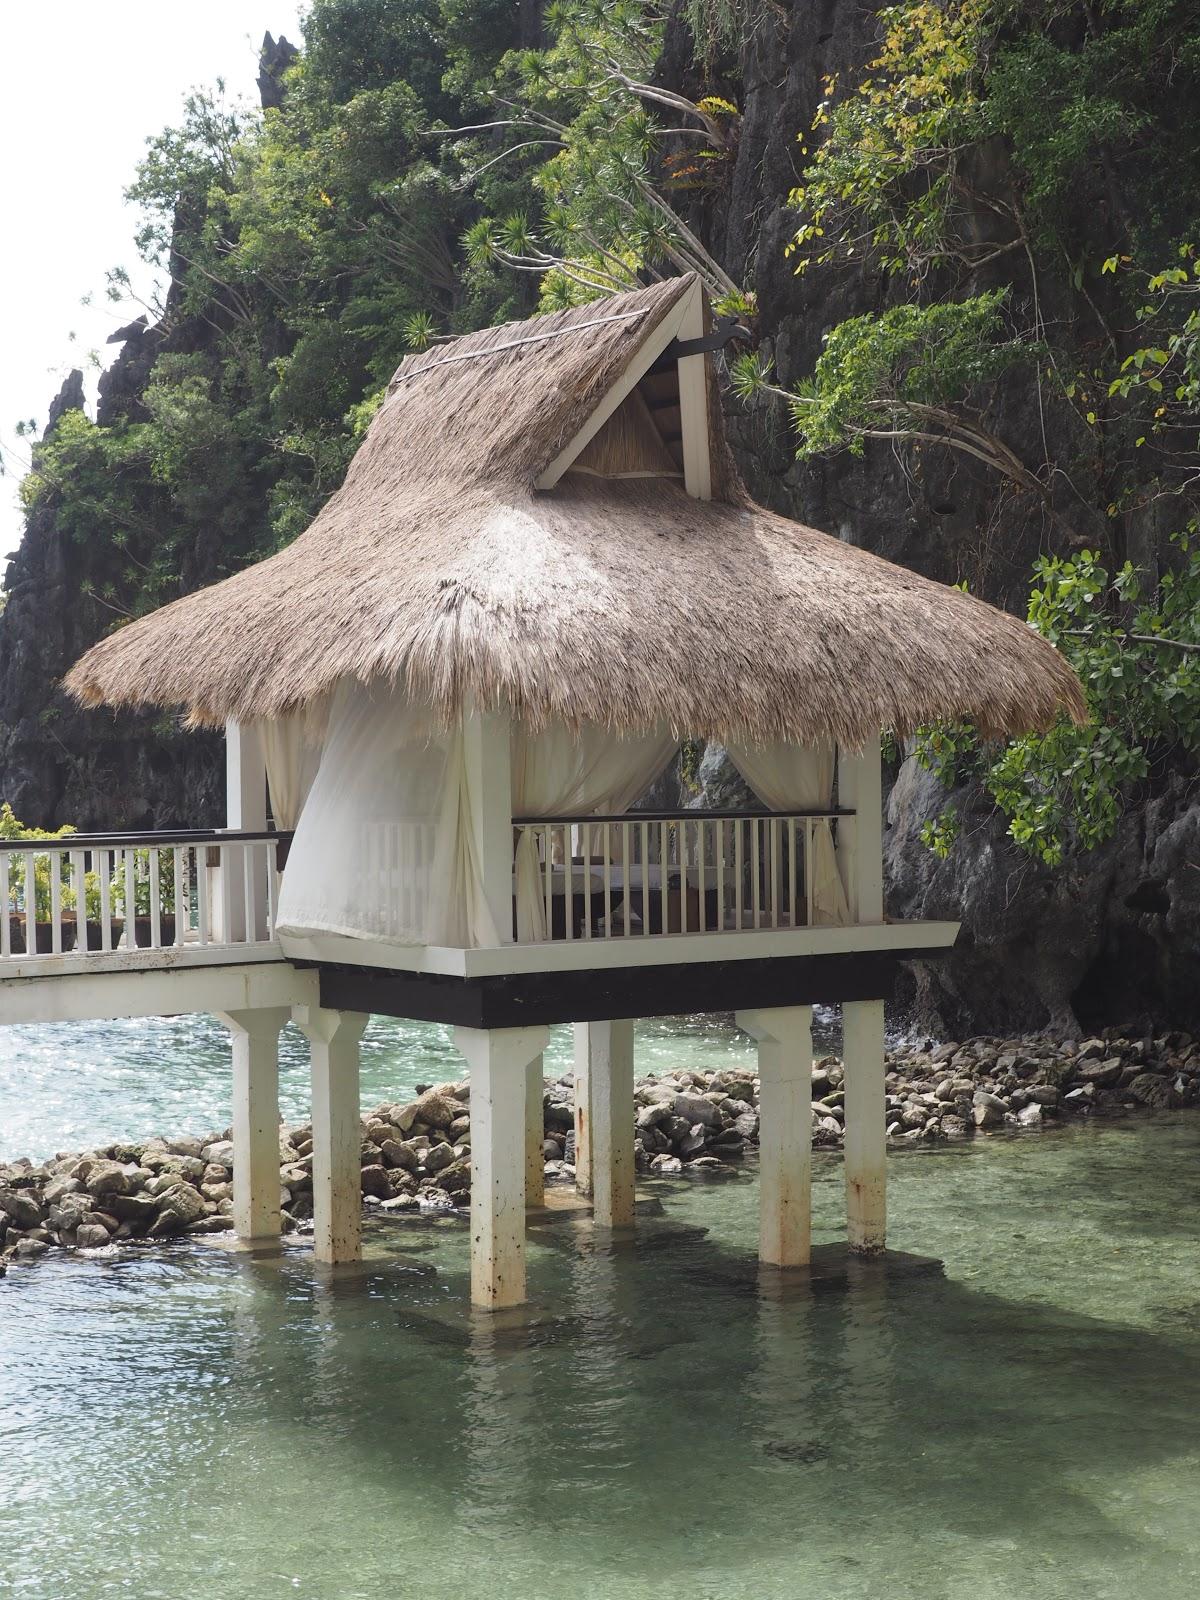 Luxury Massage Hut in the sea, El Nido Resort